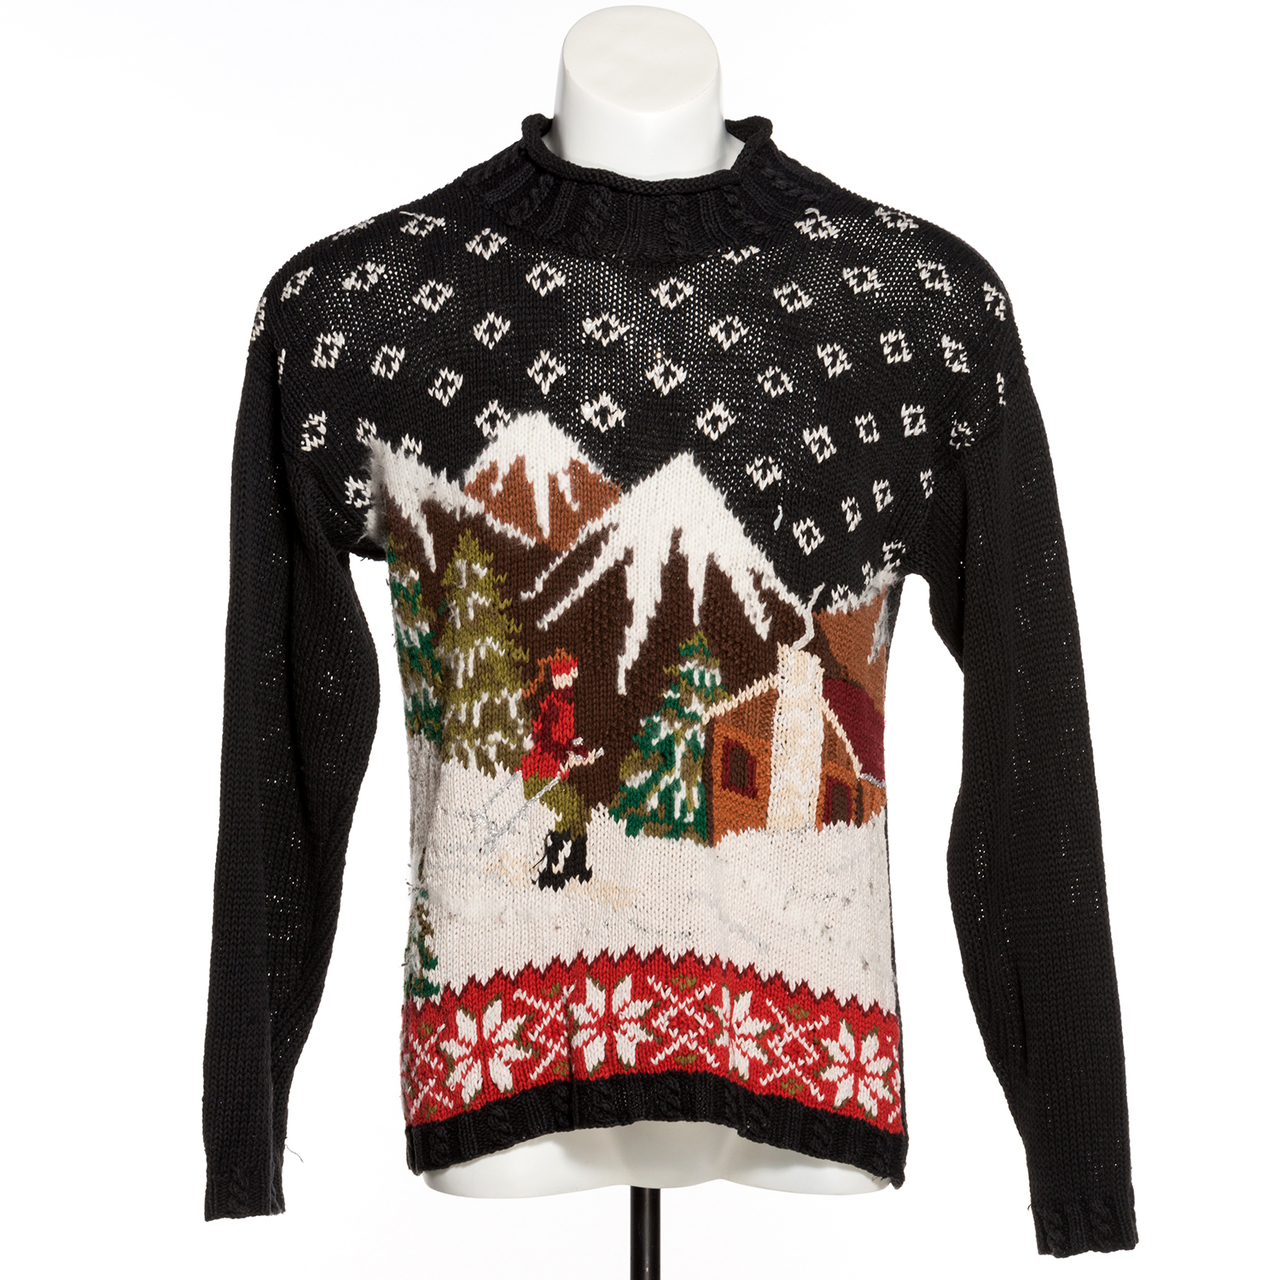 Vintage Christmas Sweaters.Ski Lodge Vintage Ugly Christmas Sweater